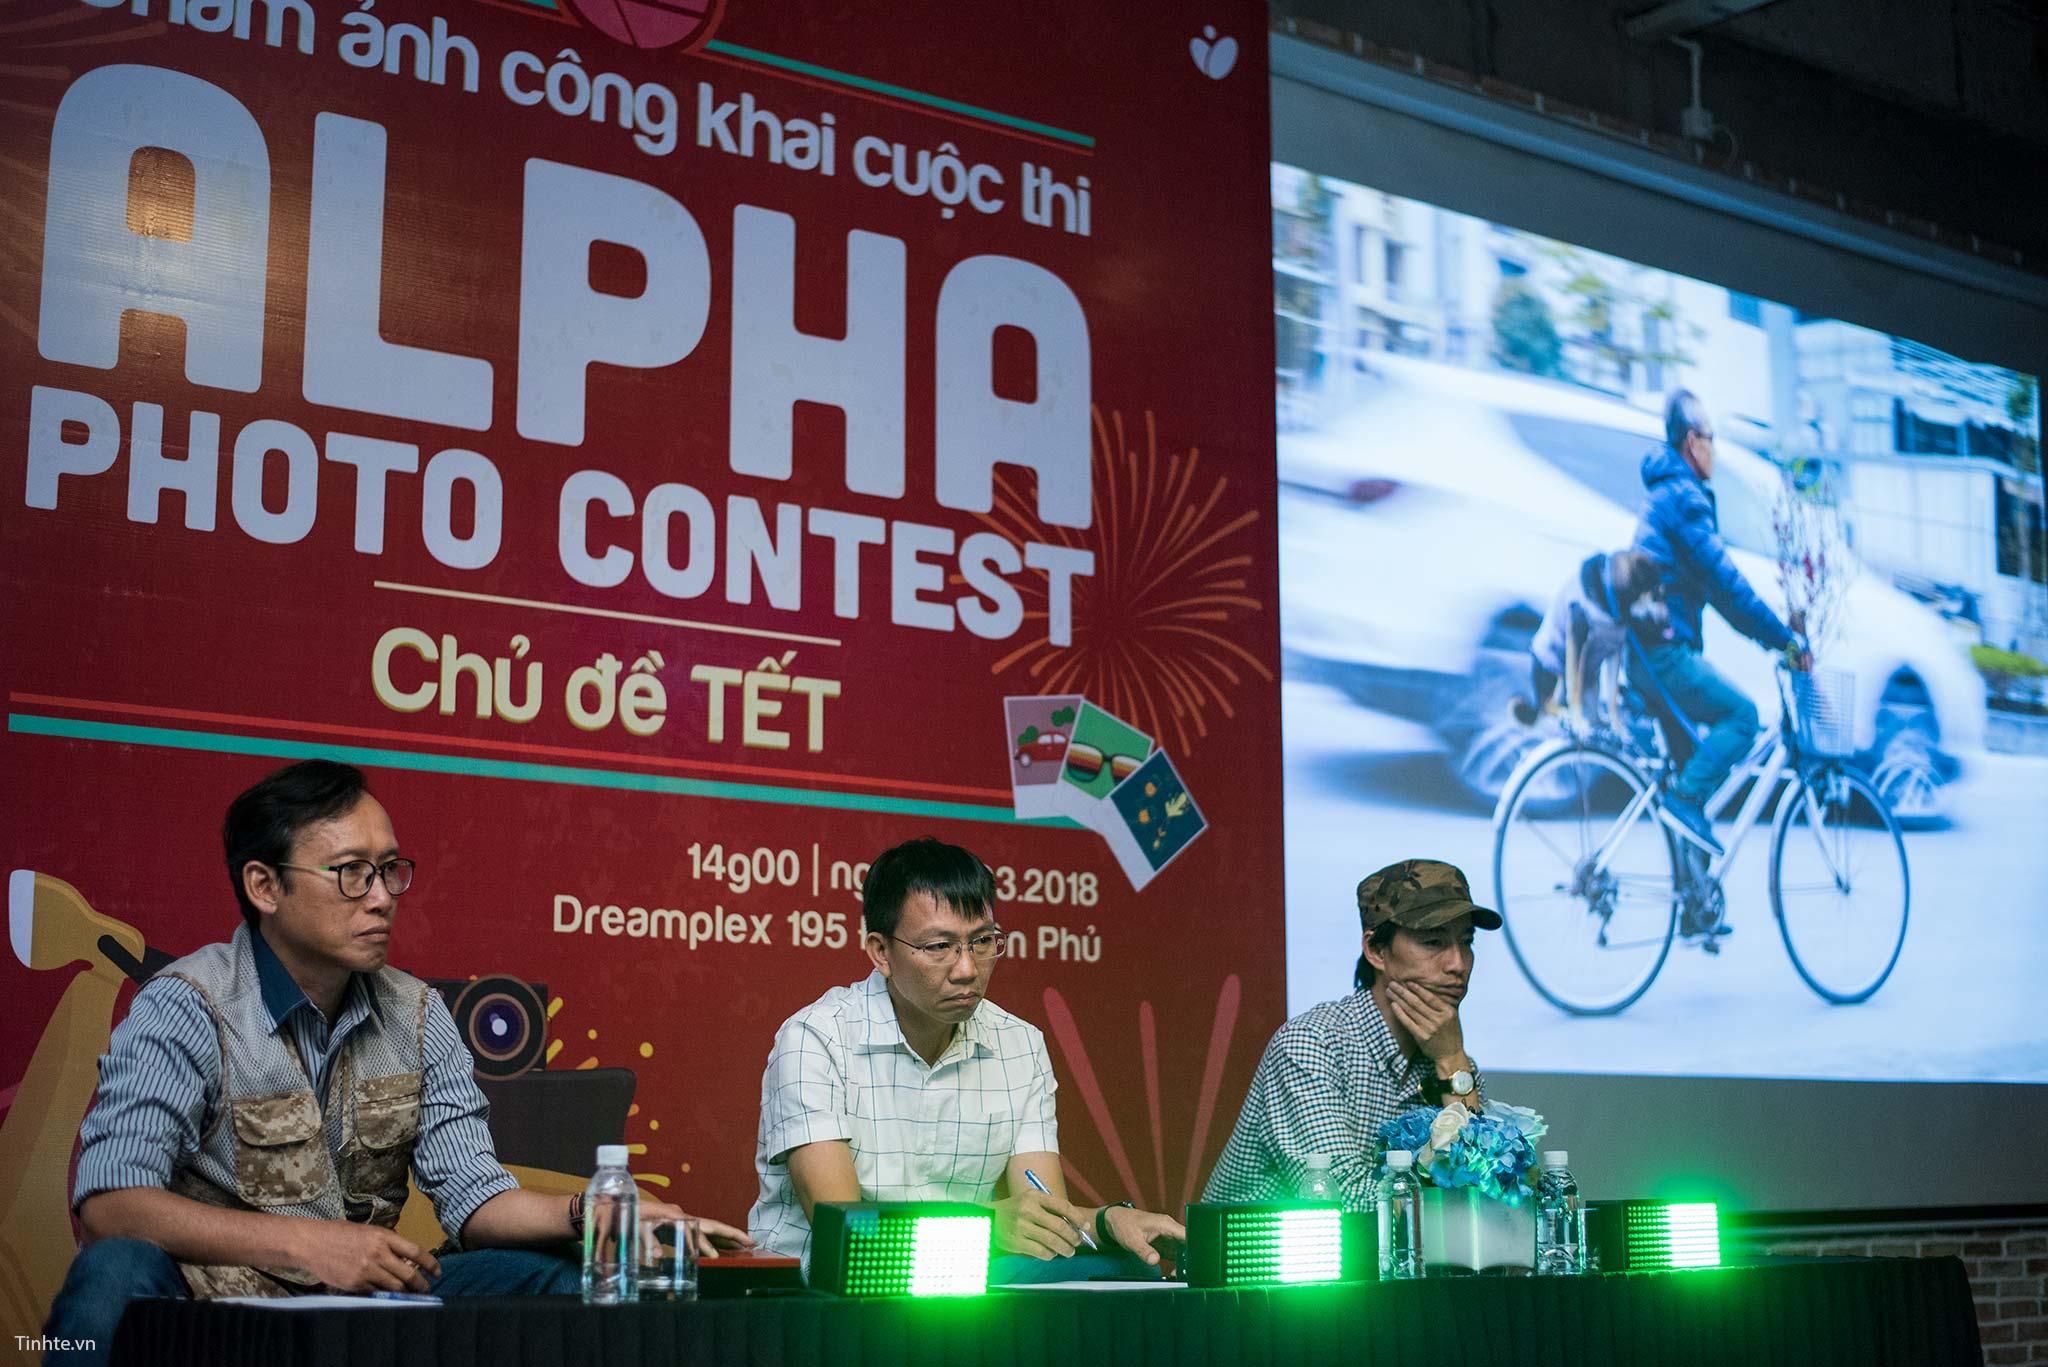 alphaphotocontest-camera.tinhte.vn-1.jpg